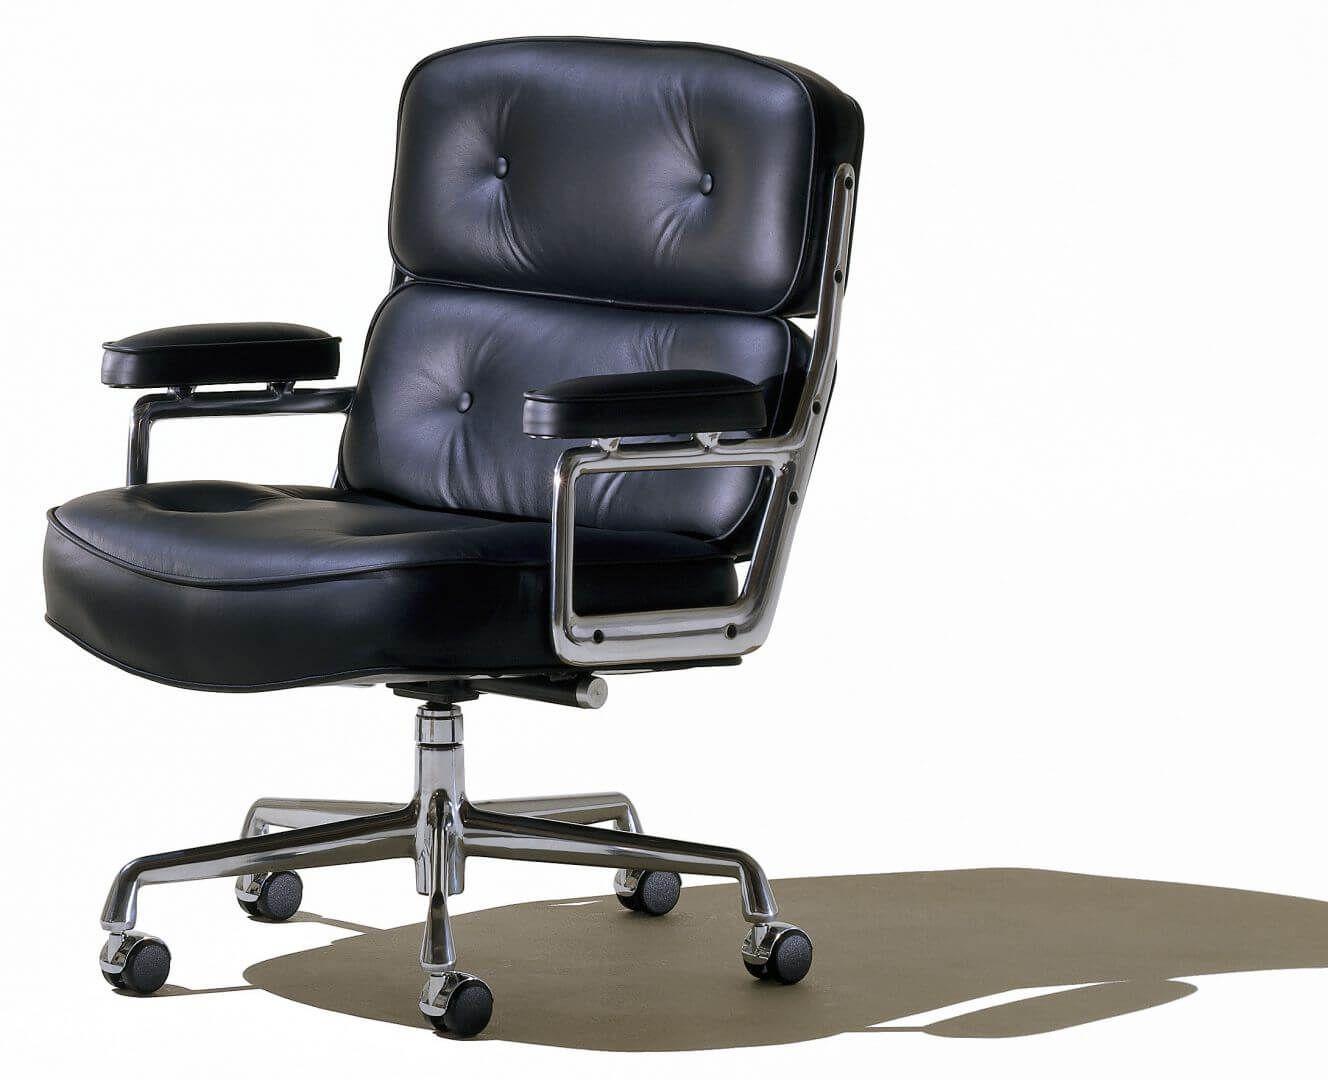 office chairs herman miller. Afficher L\u0027image D\u0027origine Office Chairs Herman Miller